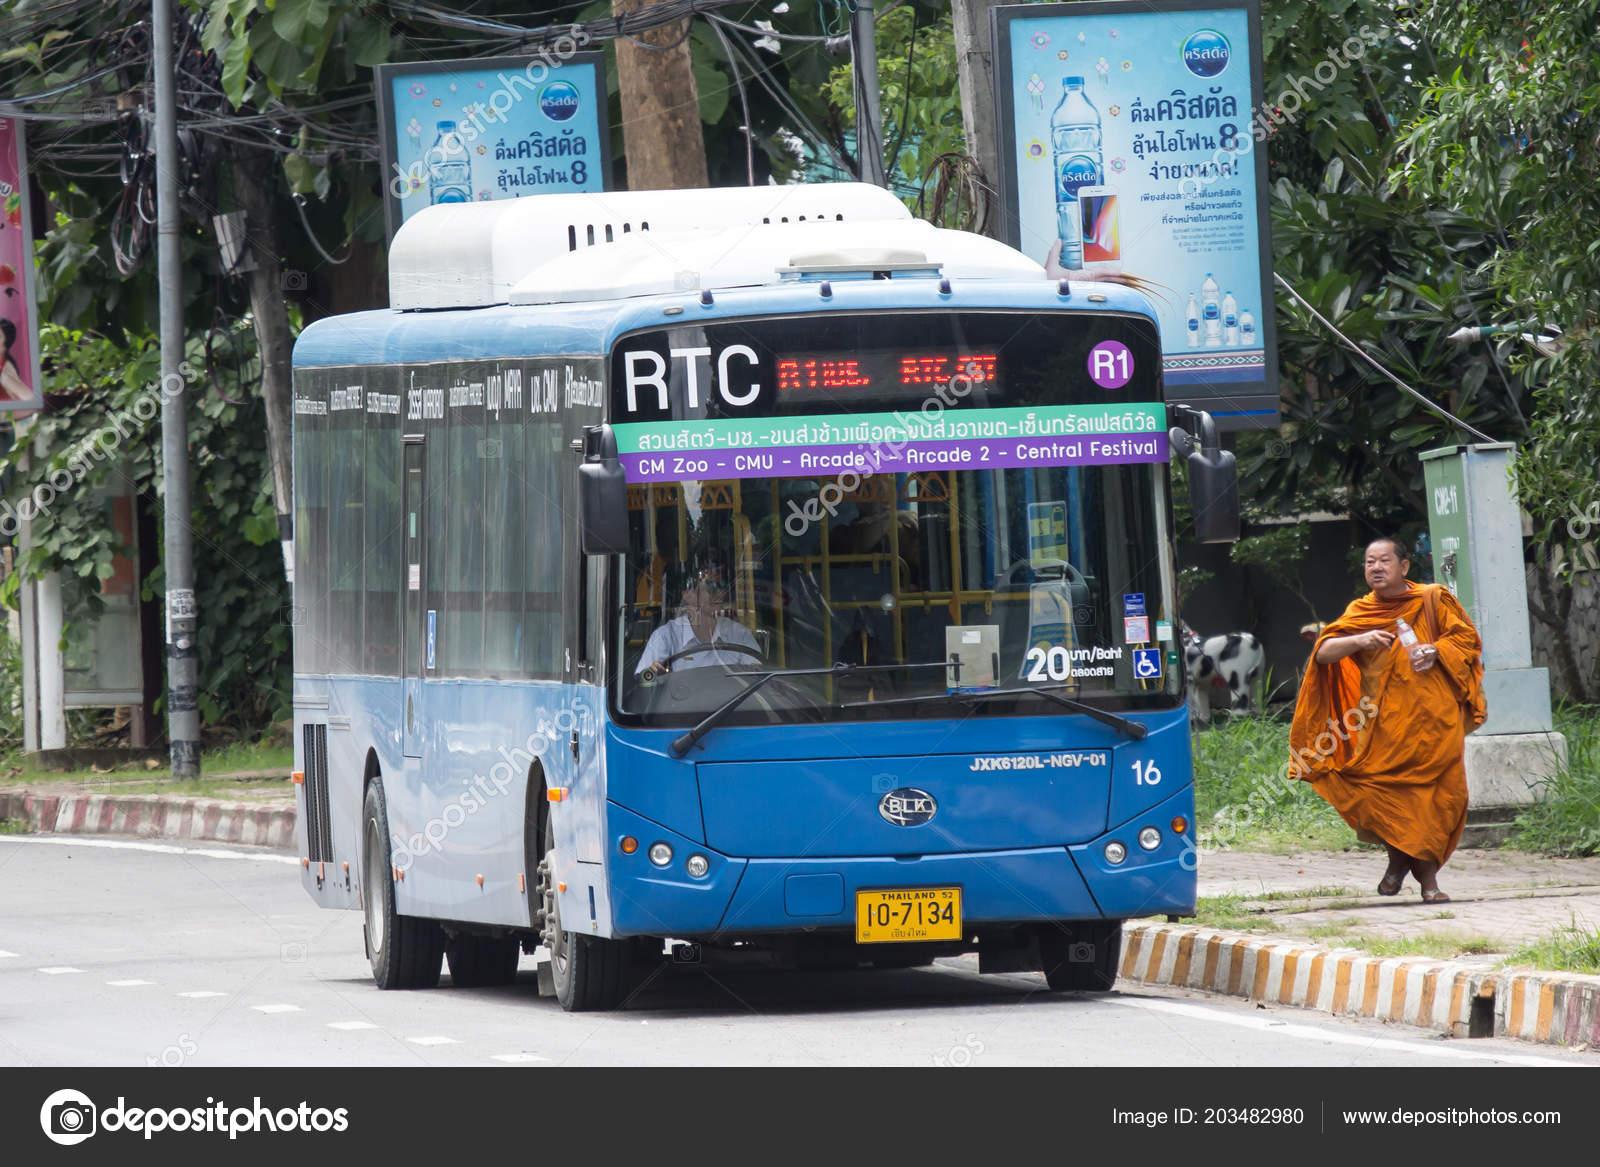 Carte Wifi Thailande.Chiang Mai Thailande Juillet 2018 Blk Autobus Rtc Bus Smart Photo